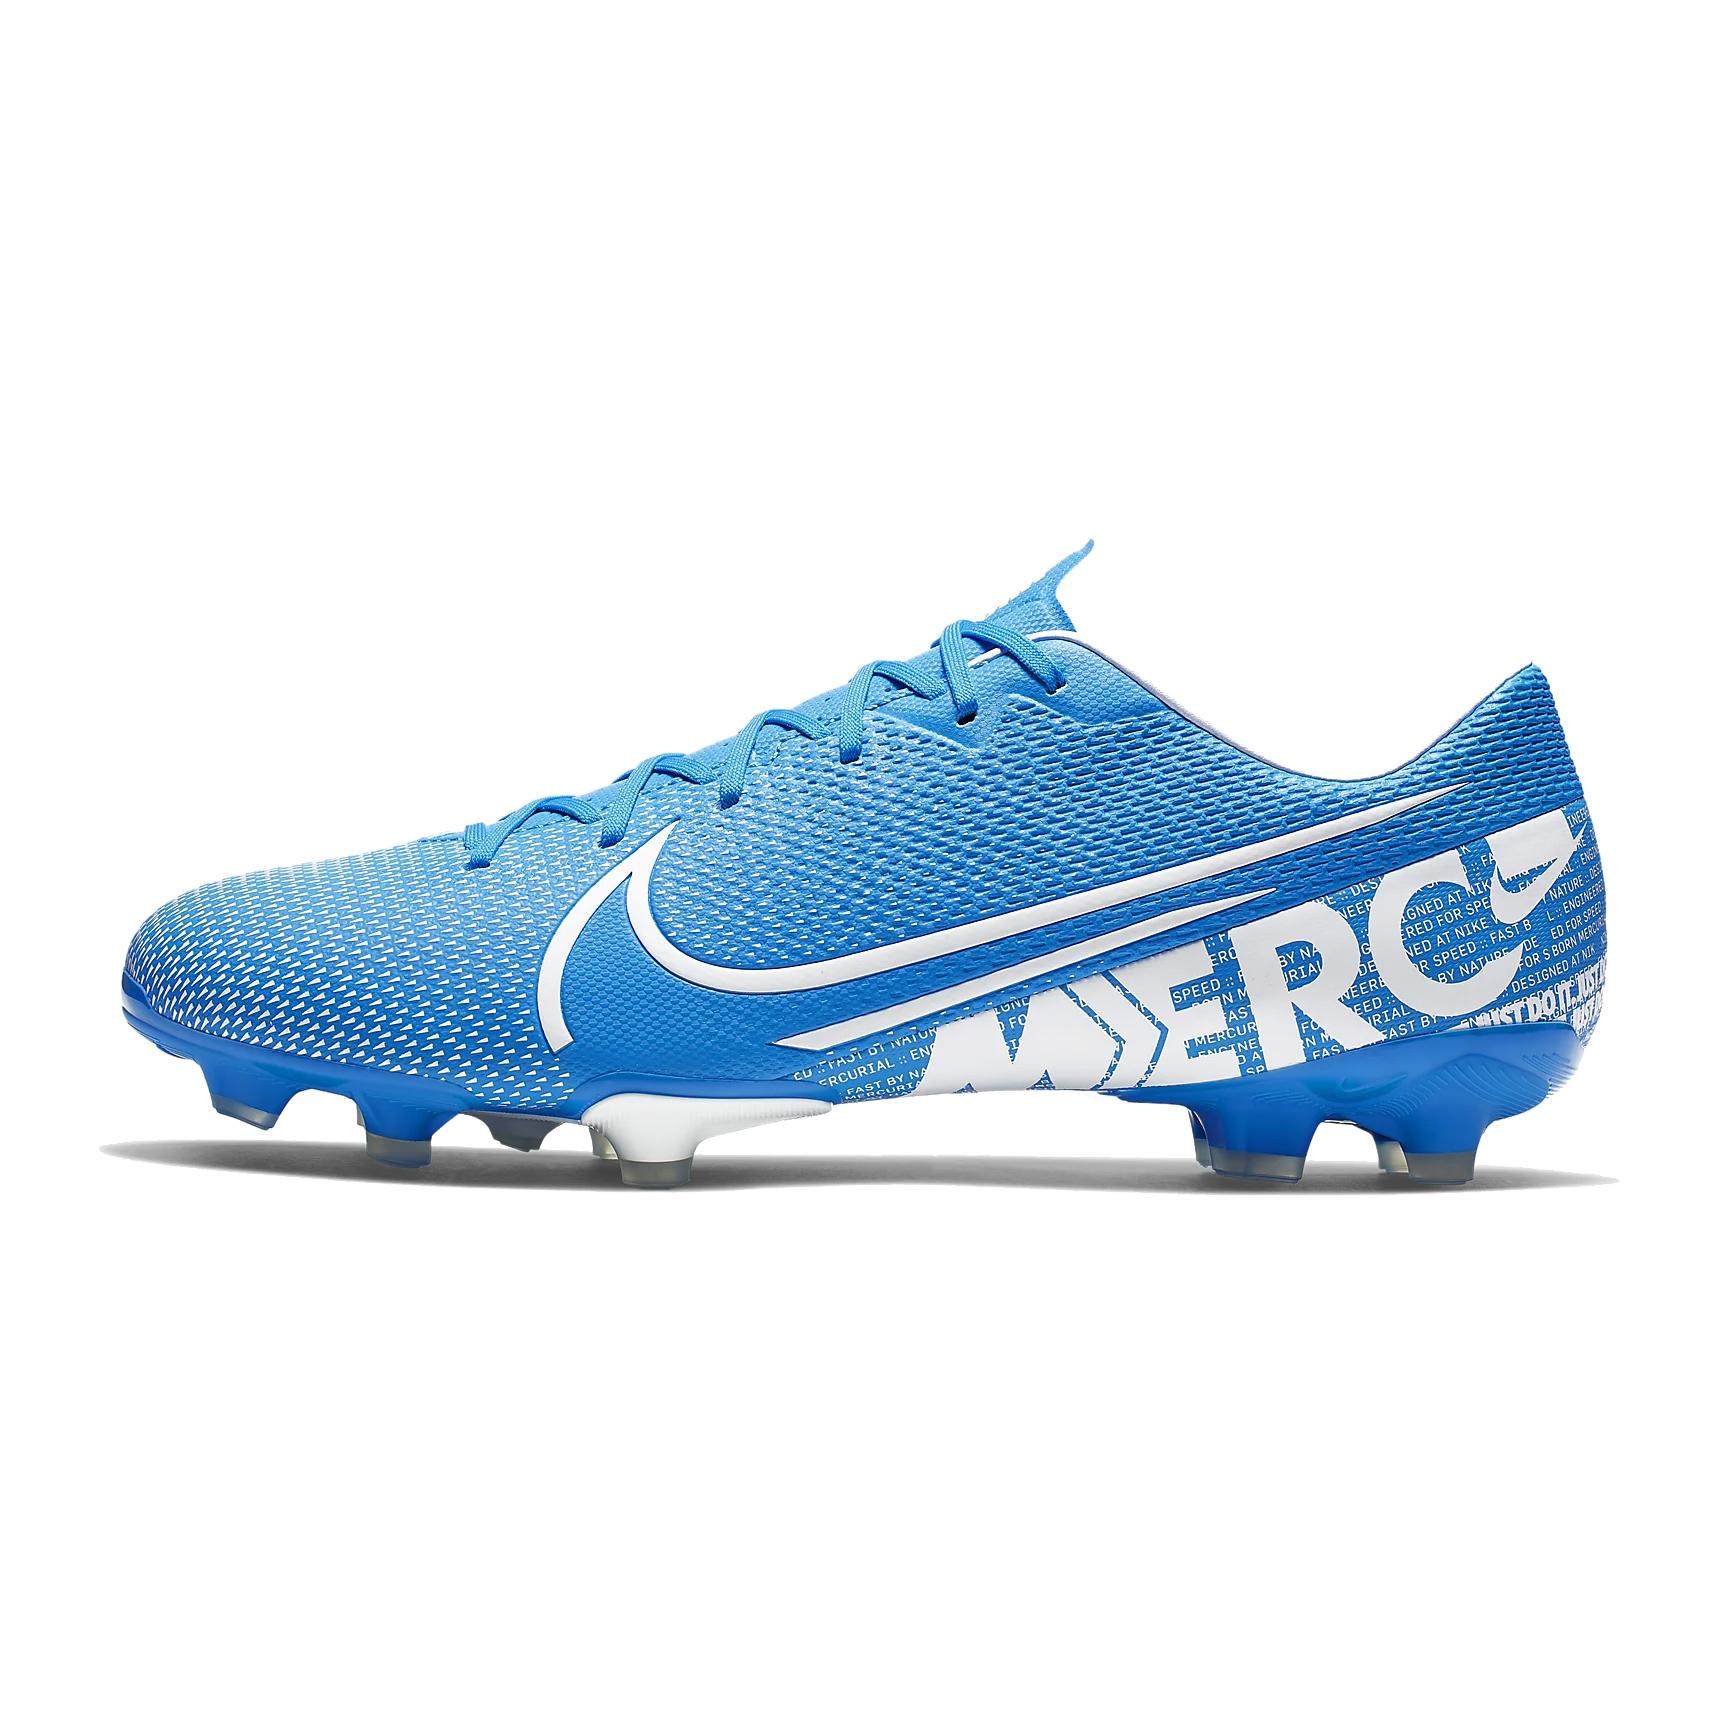 emprender Aparte Ocho  Nike Mercurial Vapor 13 Academy MG Football Boots - Blue/White | Jarrold,  Norwich